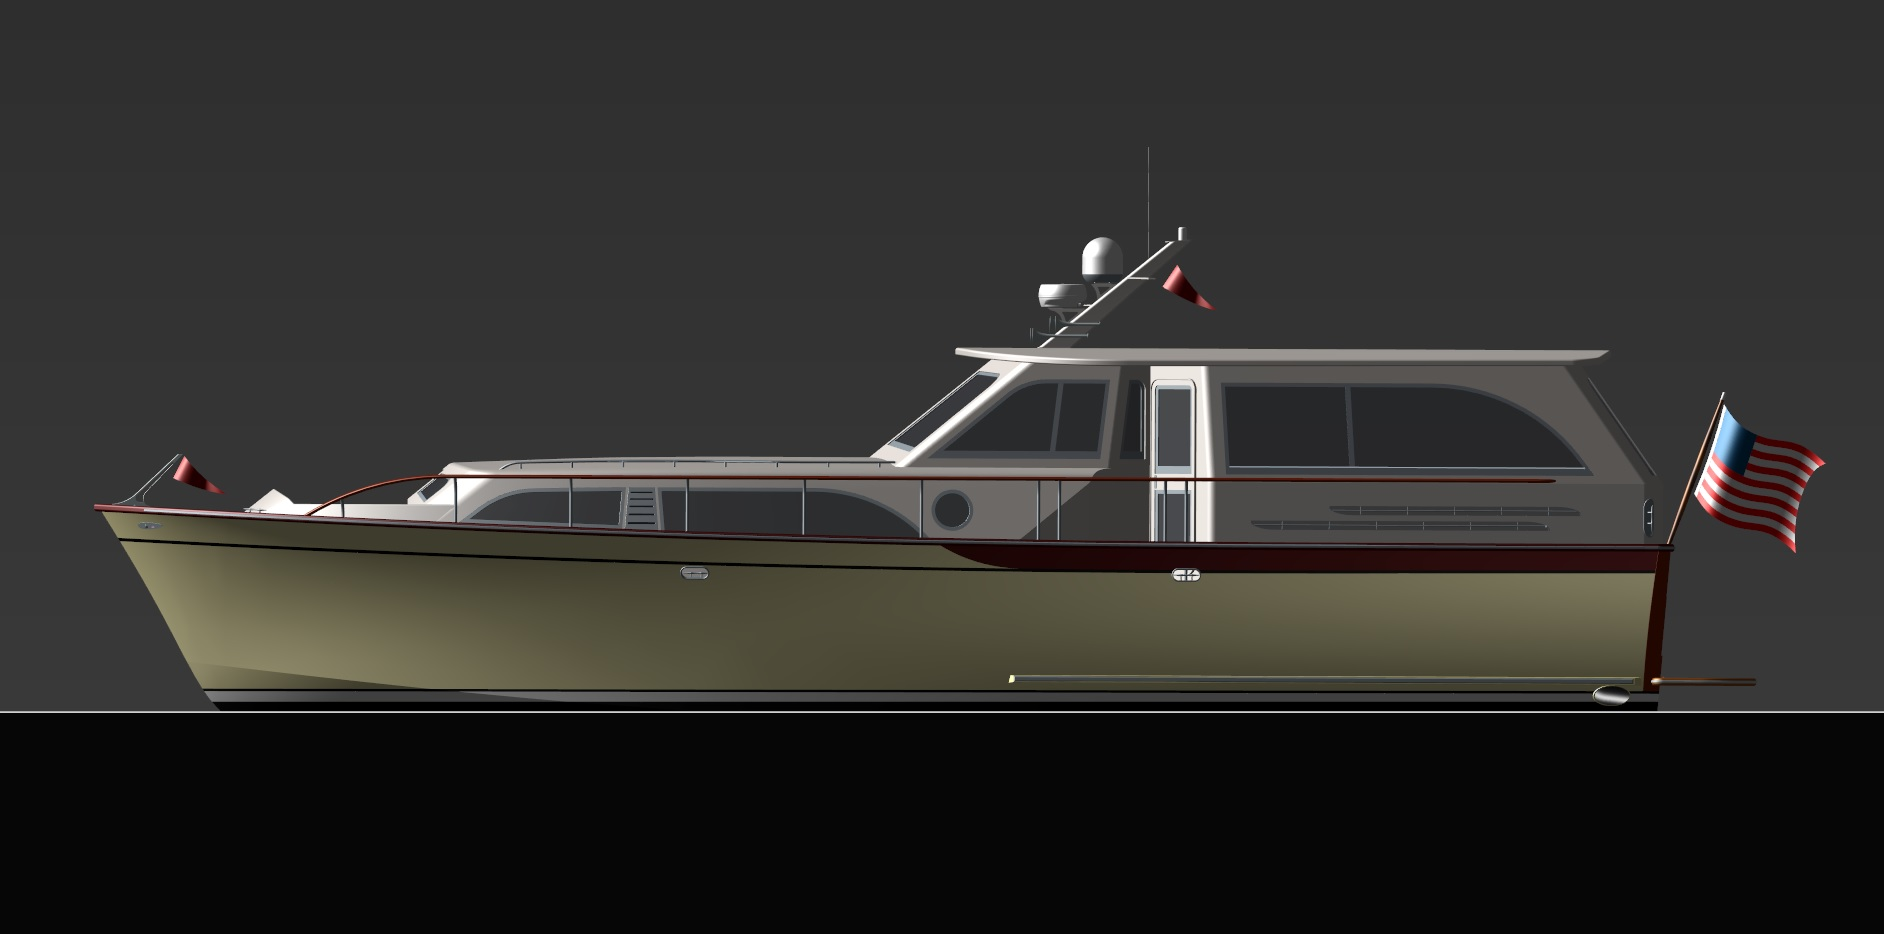 Van Dam Custom Boats sunray rendering